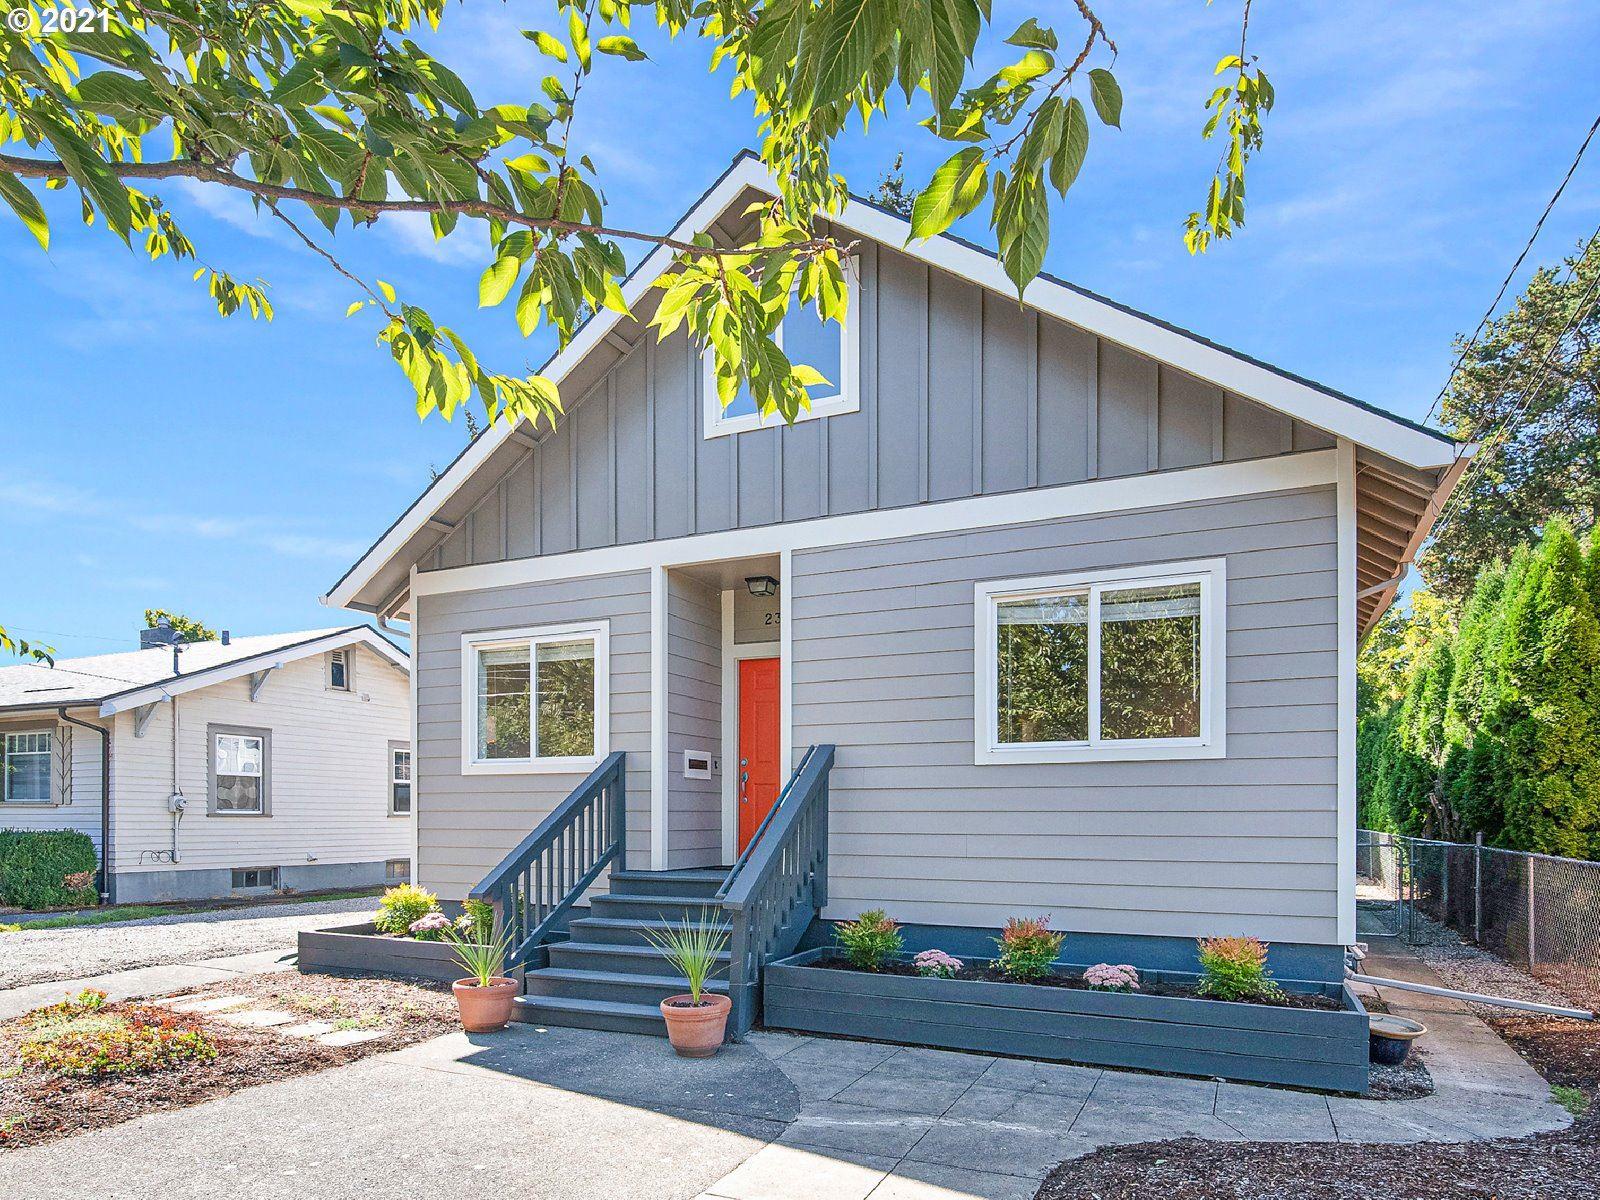 235 NE 84TH AVE, Portland, OR 97220 - MLS#: 21529101